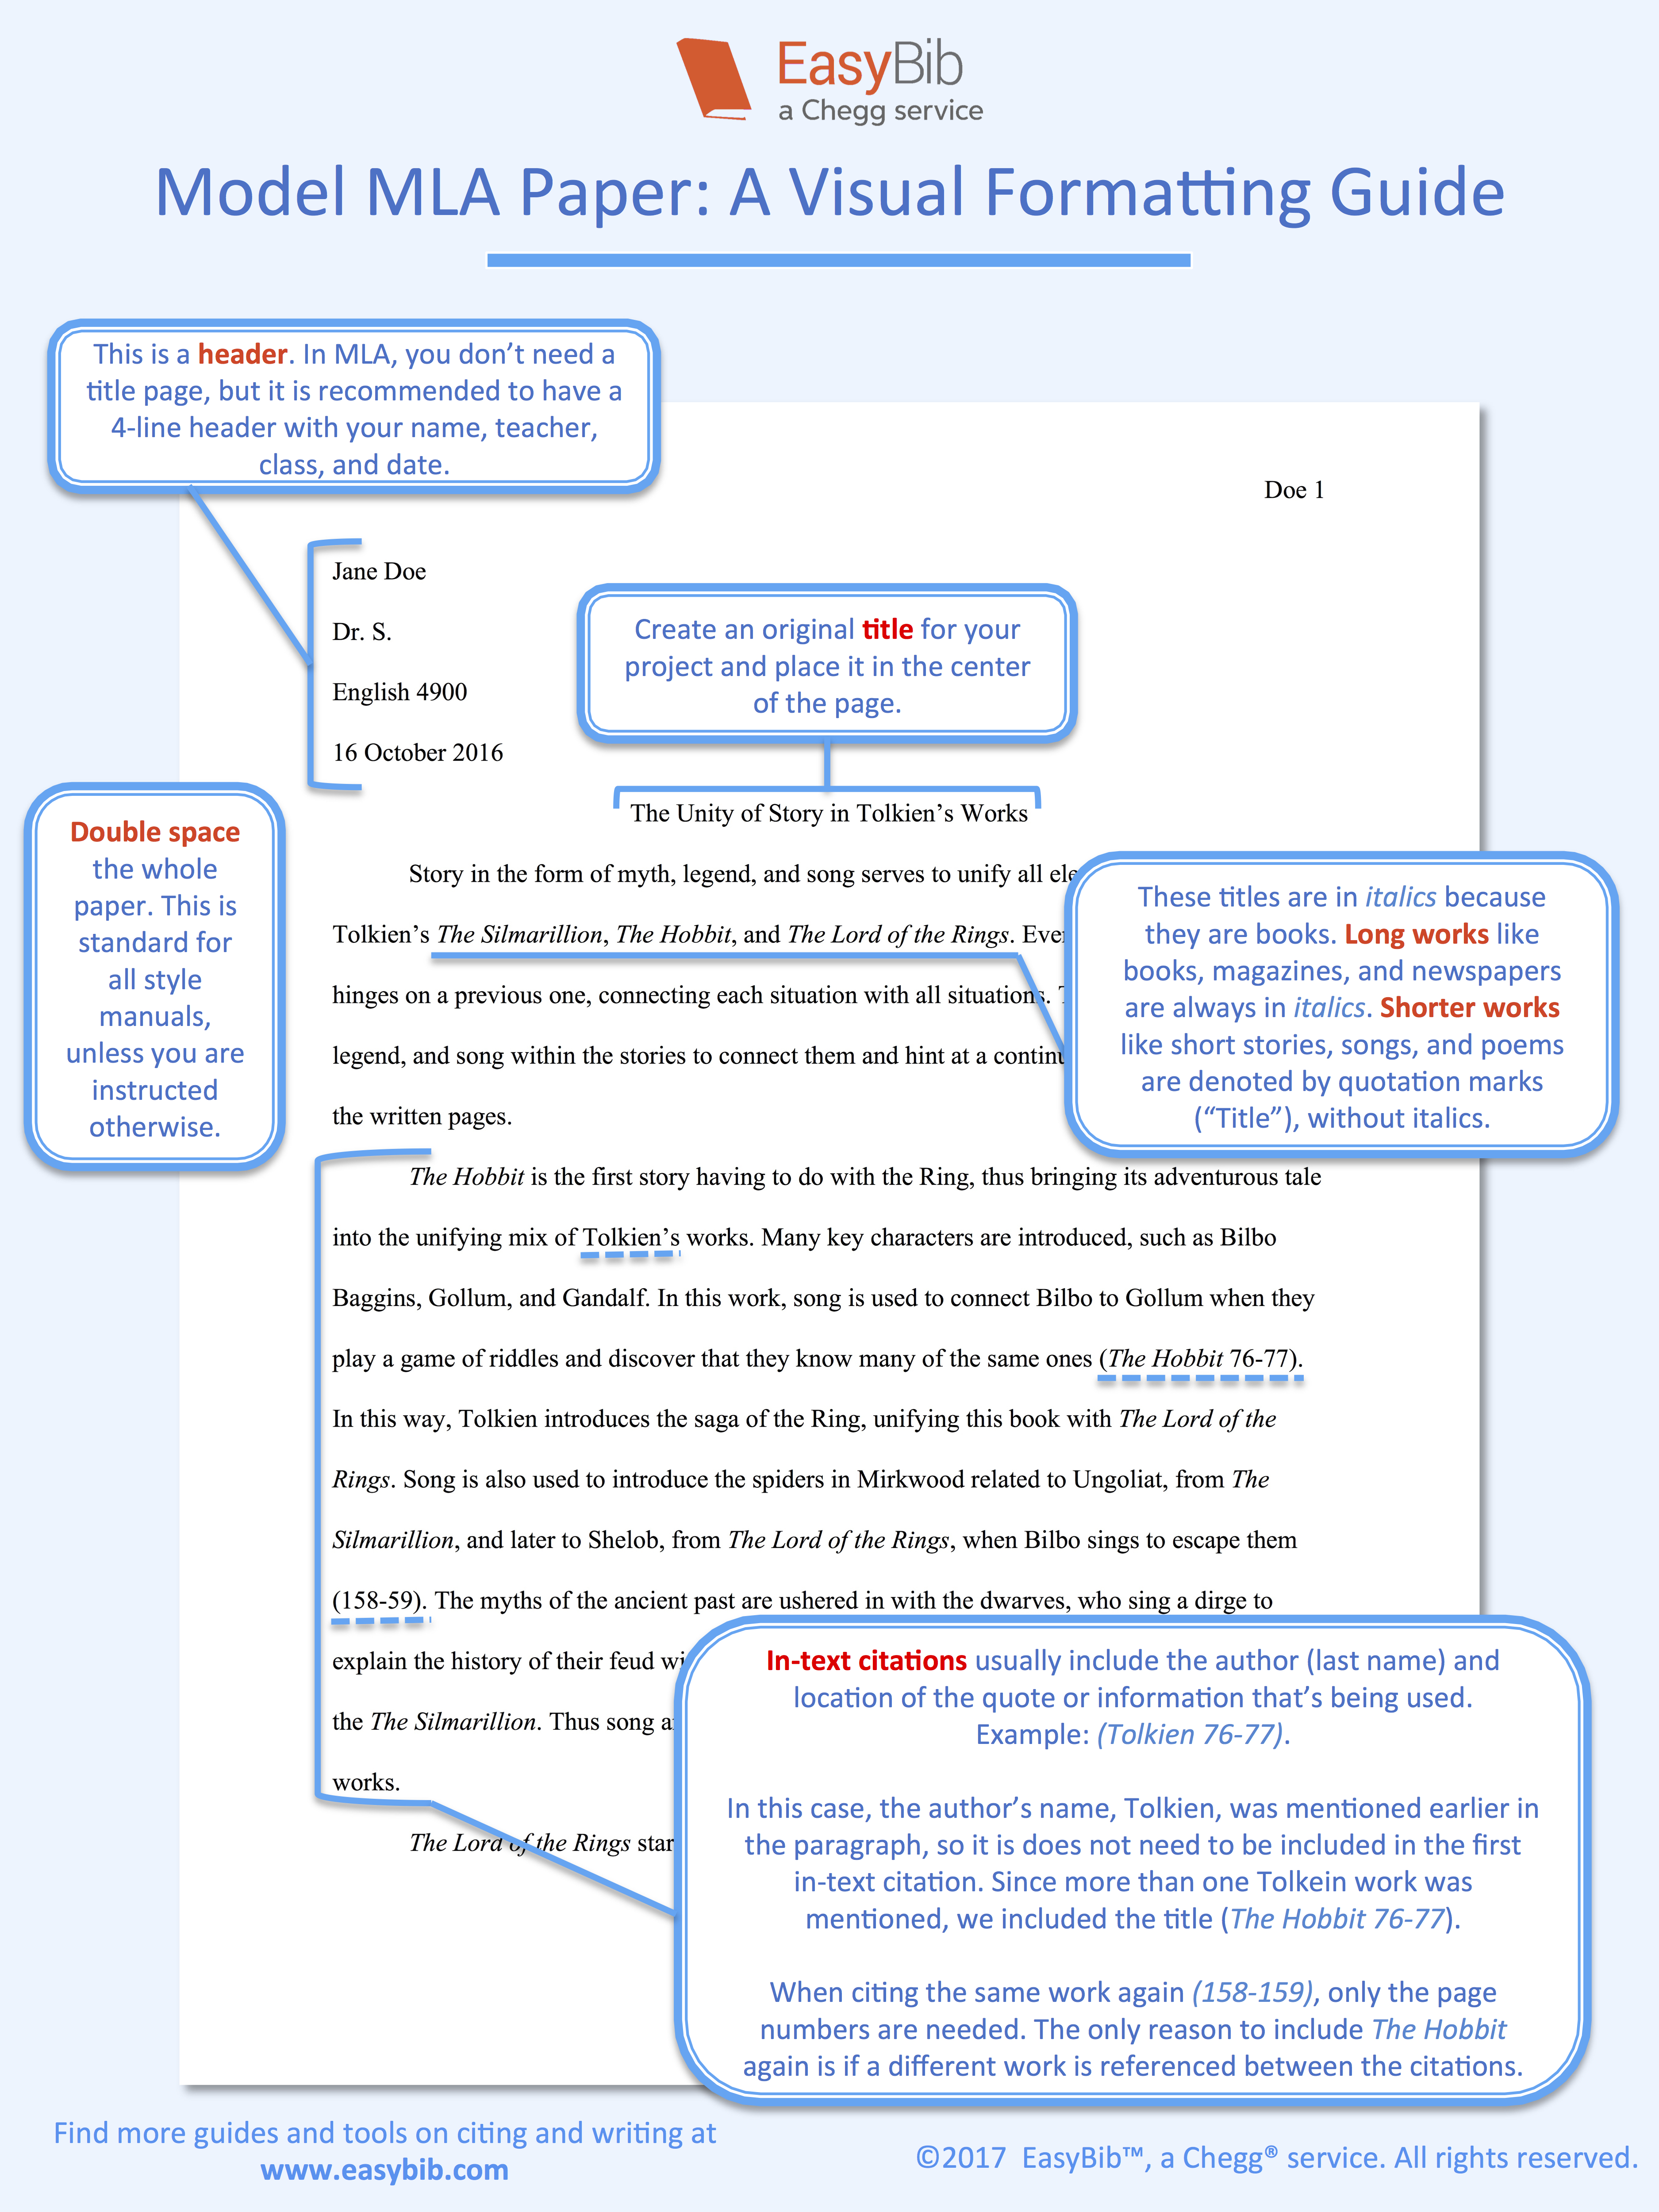 002 Essay Bib Model Mla Paper Fearsome Easybib Works Cited Chicago Citation Generator Apa Format Full